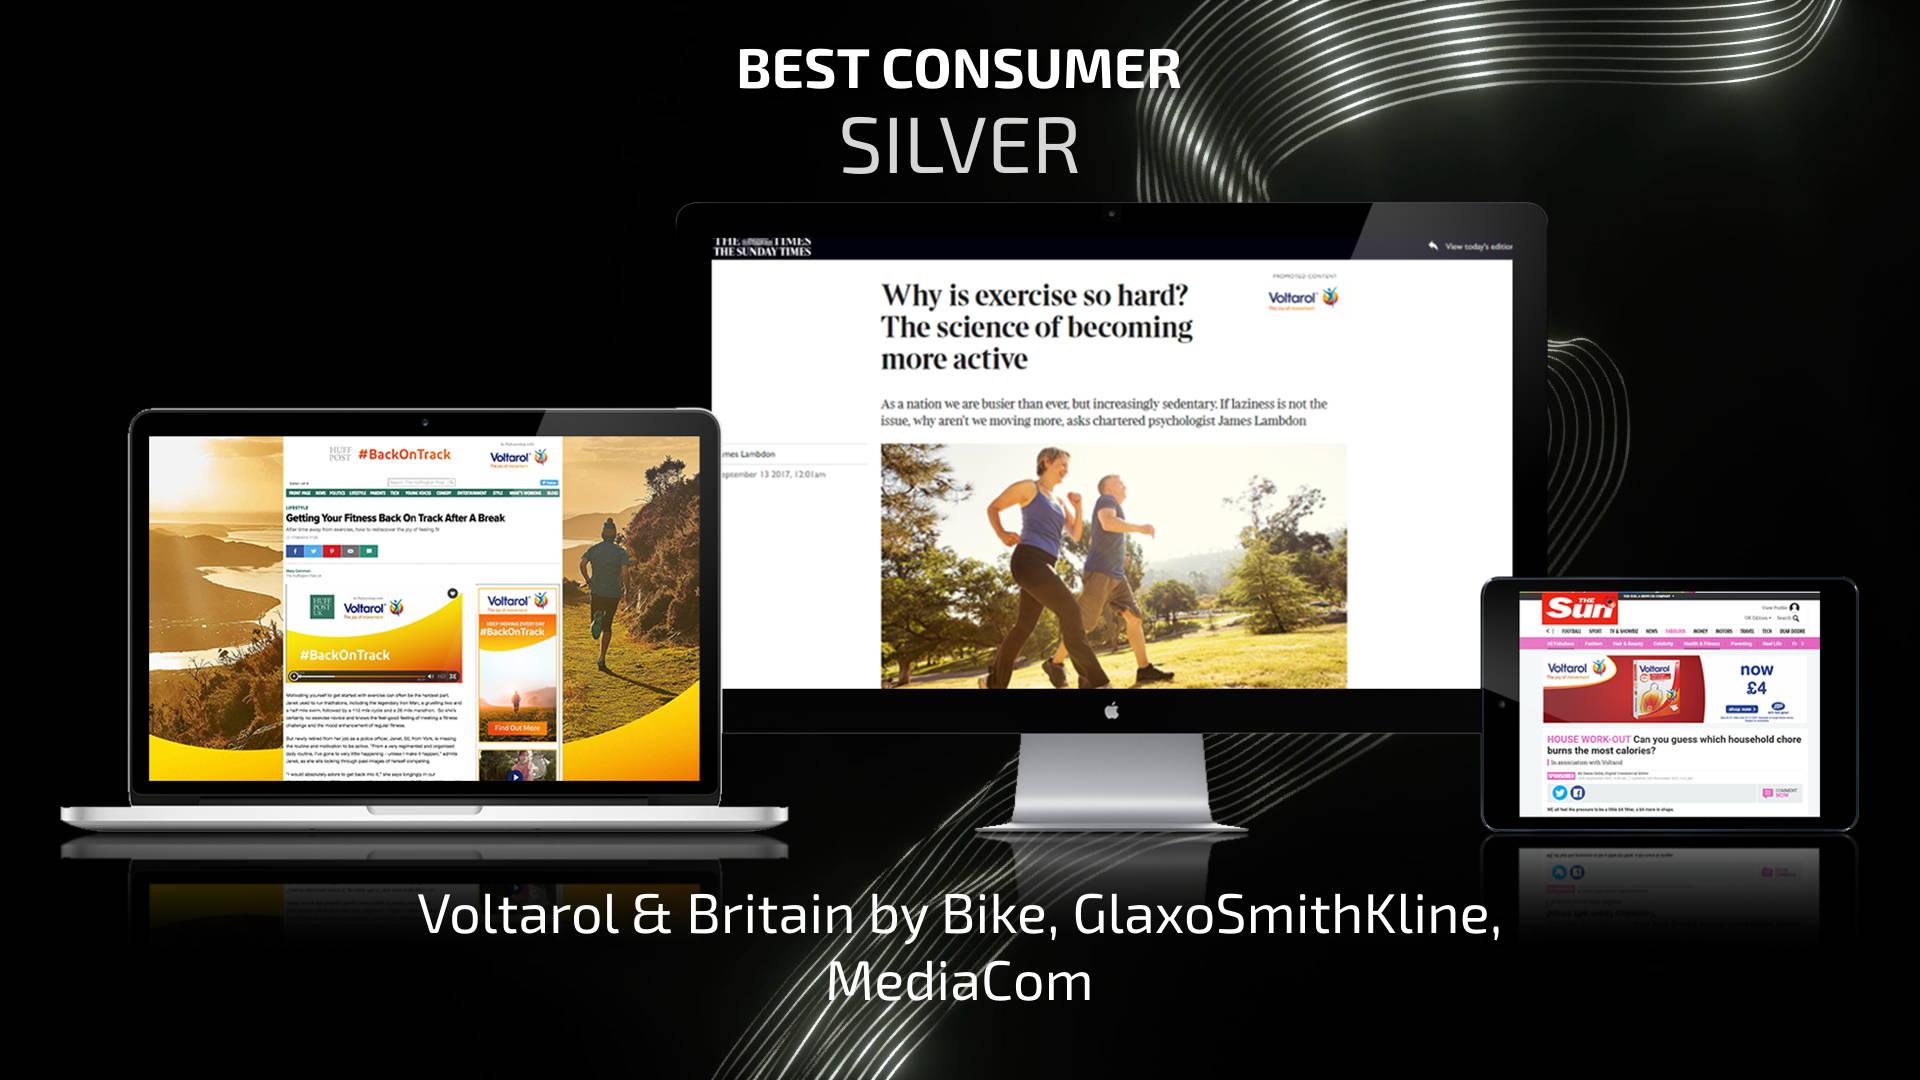 Best Consumer - Silver